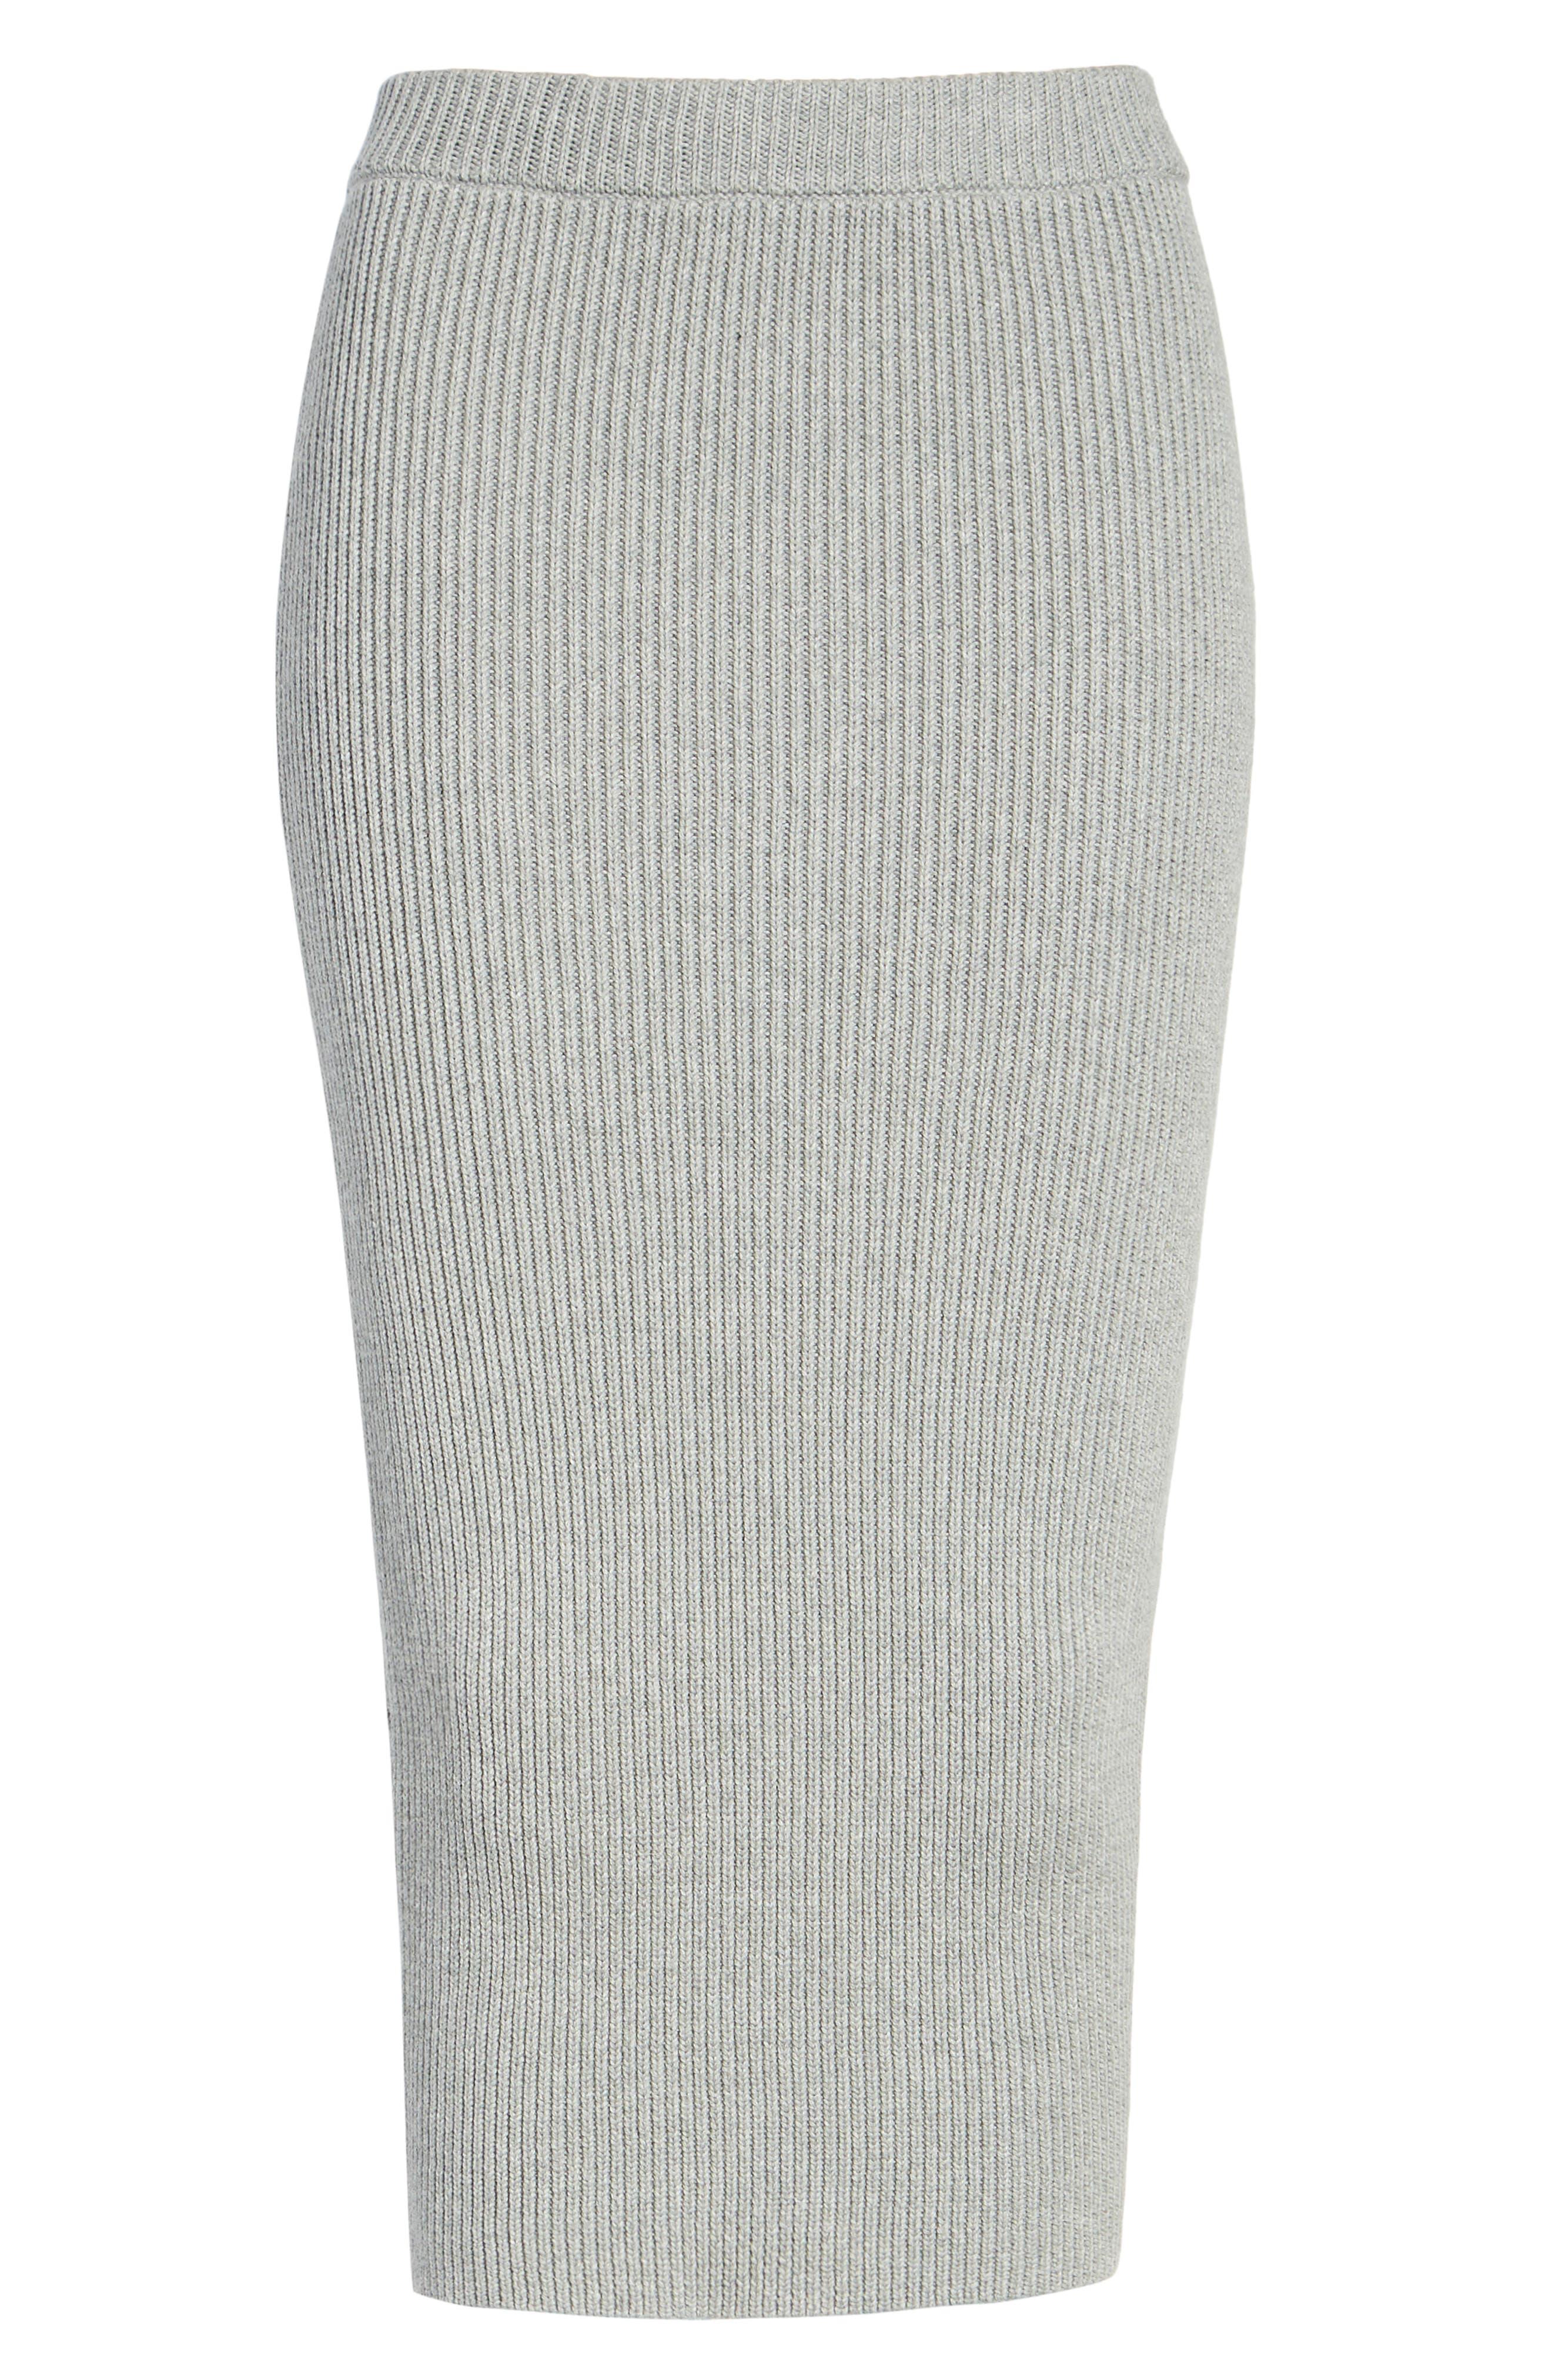 Galactic Knit Skirt,                             Alternate thumbnail 6, color,                             051